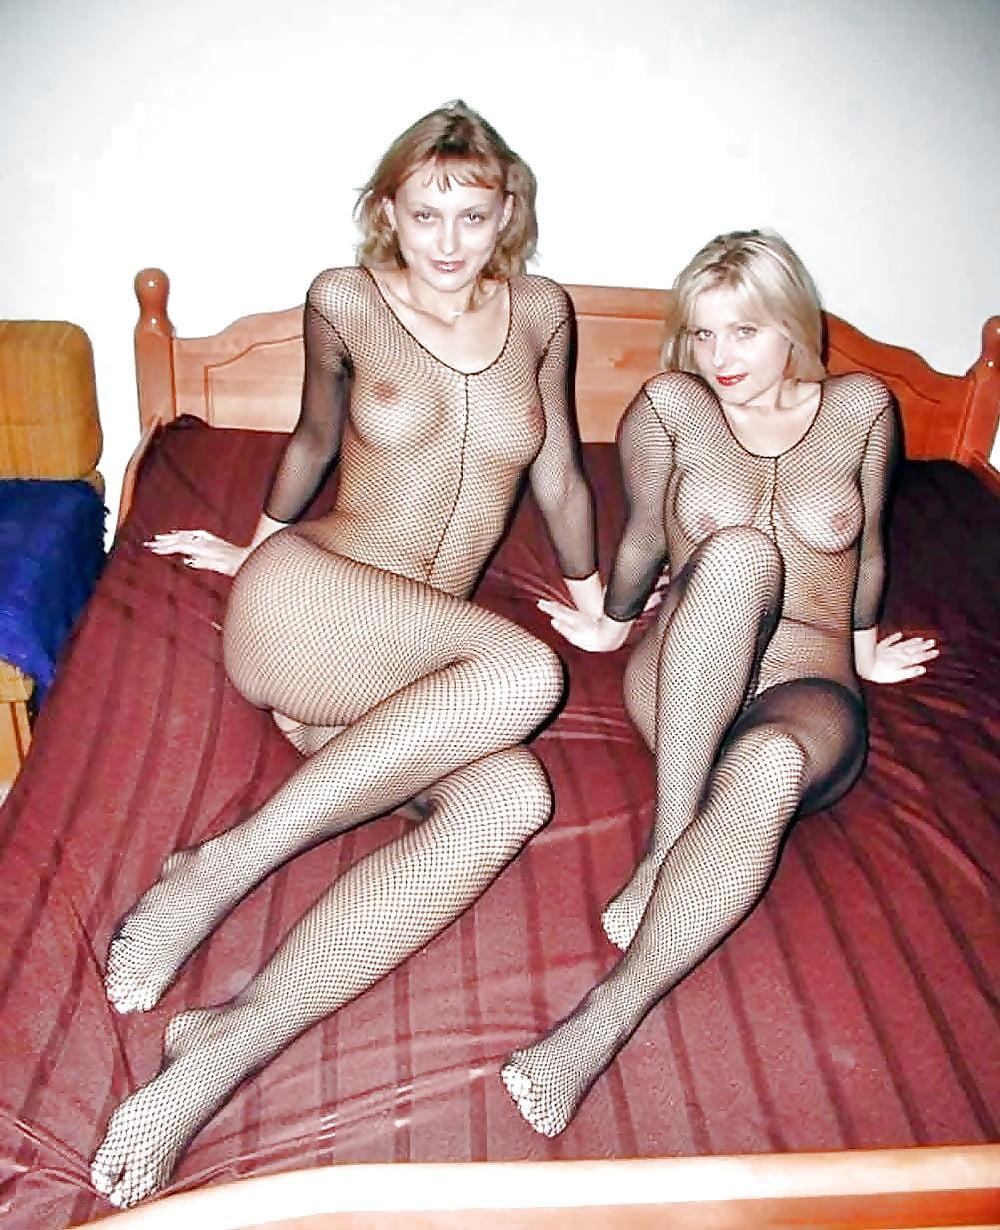 mother-daughter-wearing-pantyhose-gallery-pics-desi